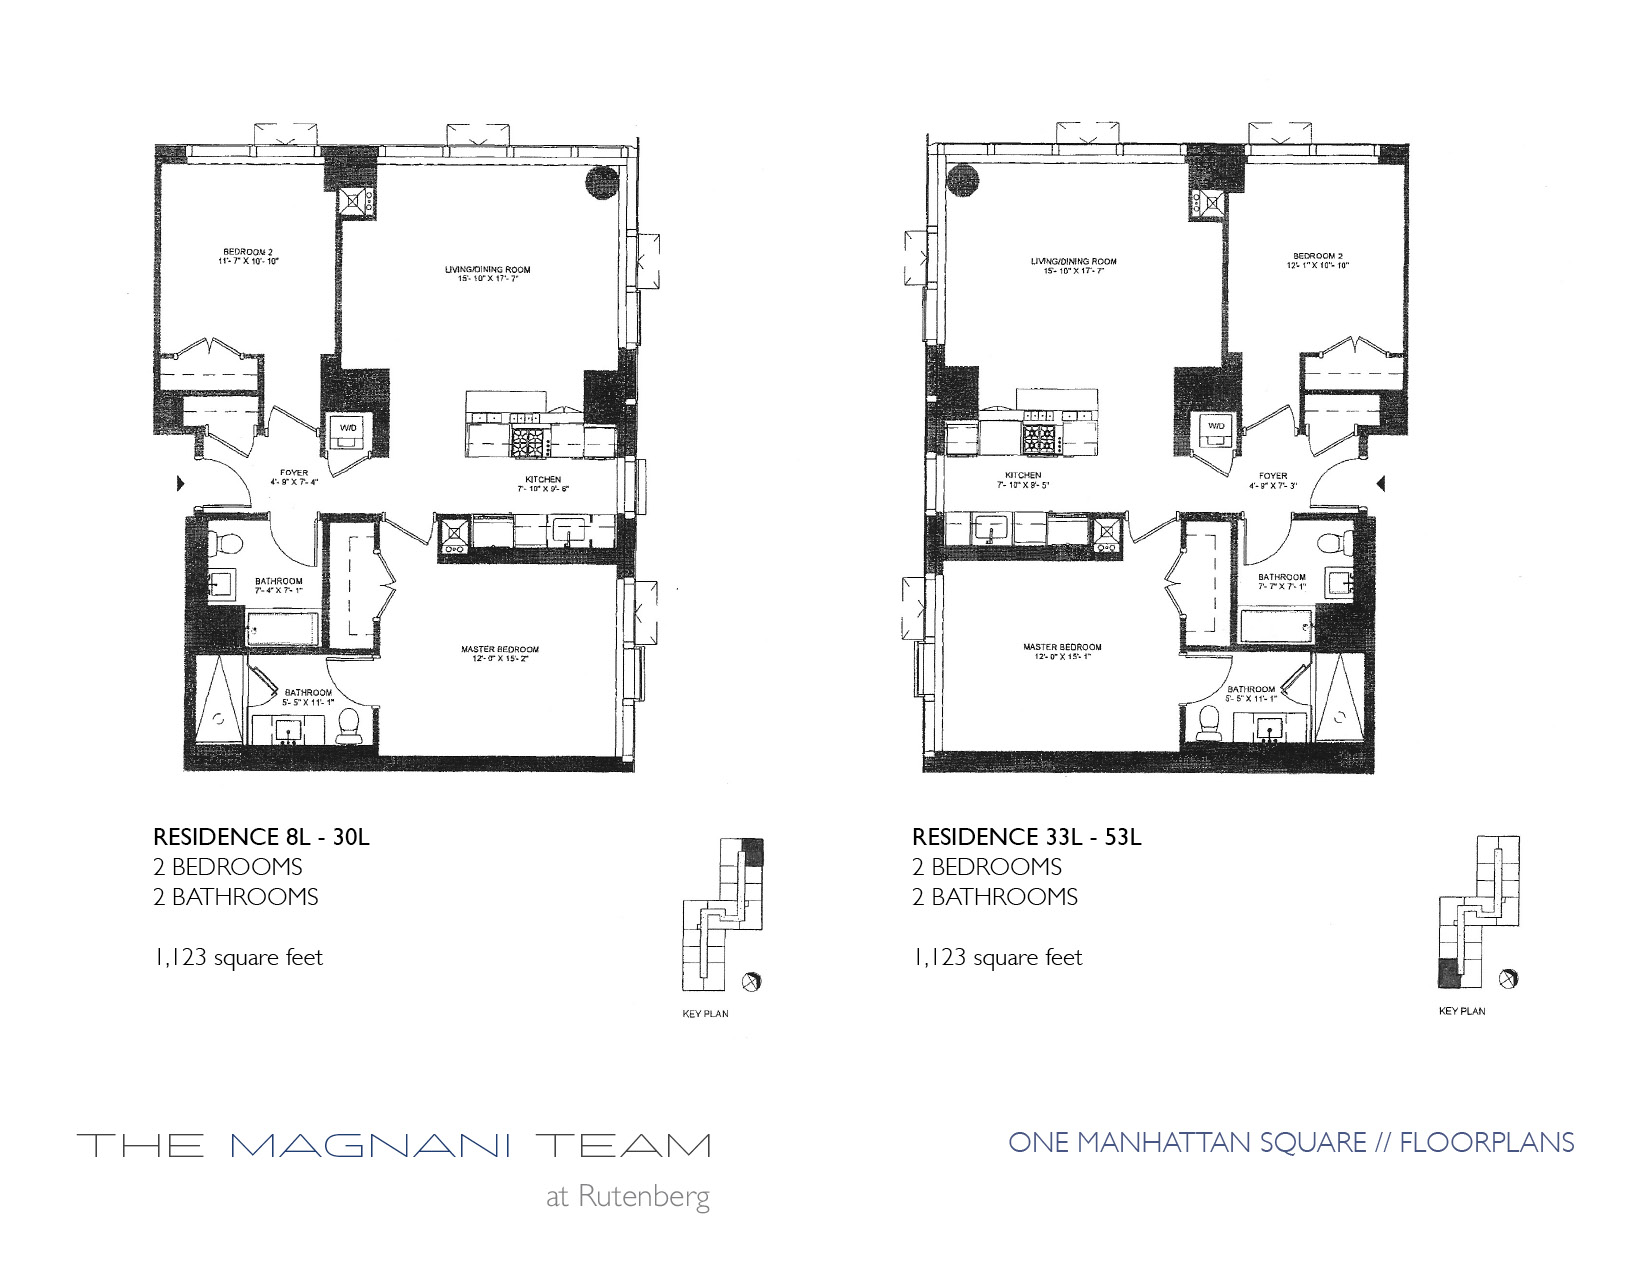 The Magnani Team - One Manhattan Square10.jpg